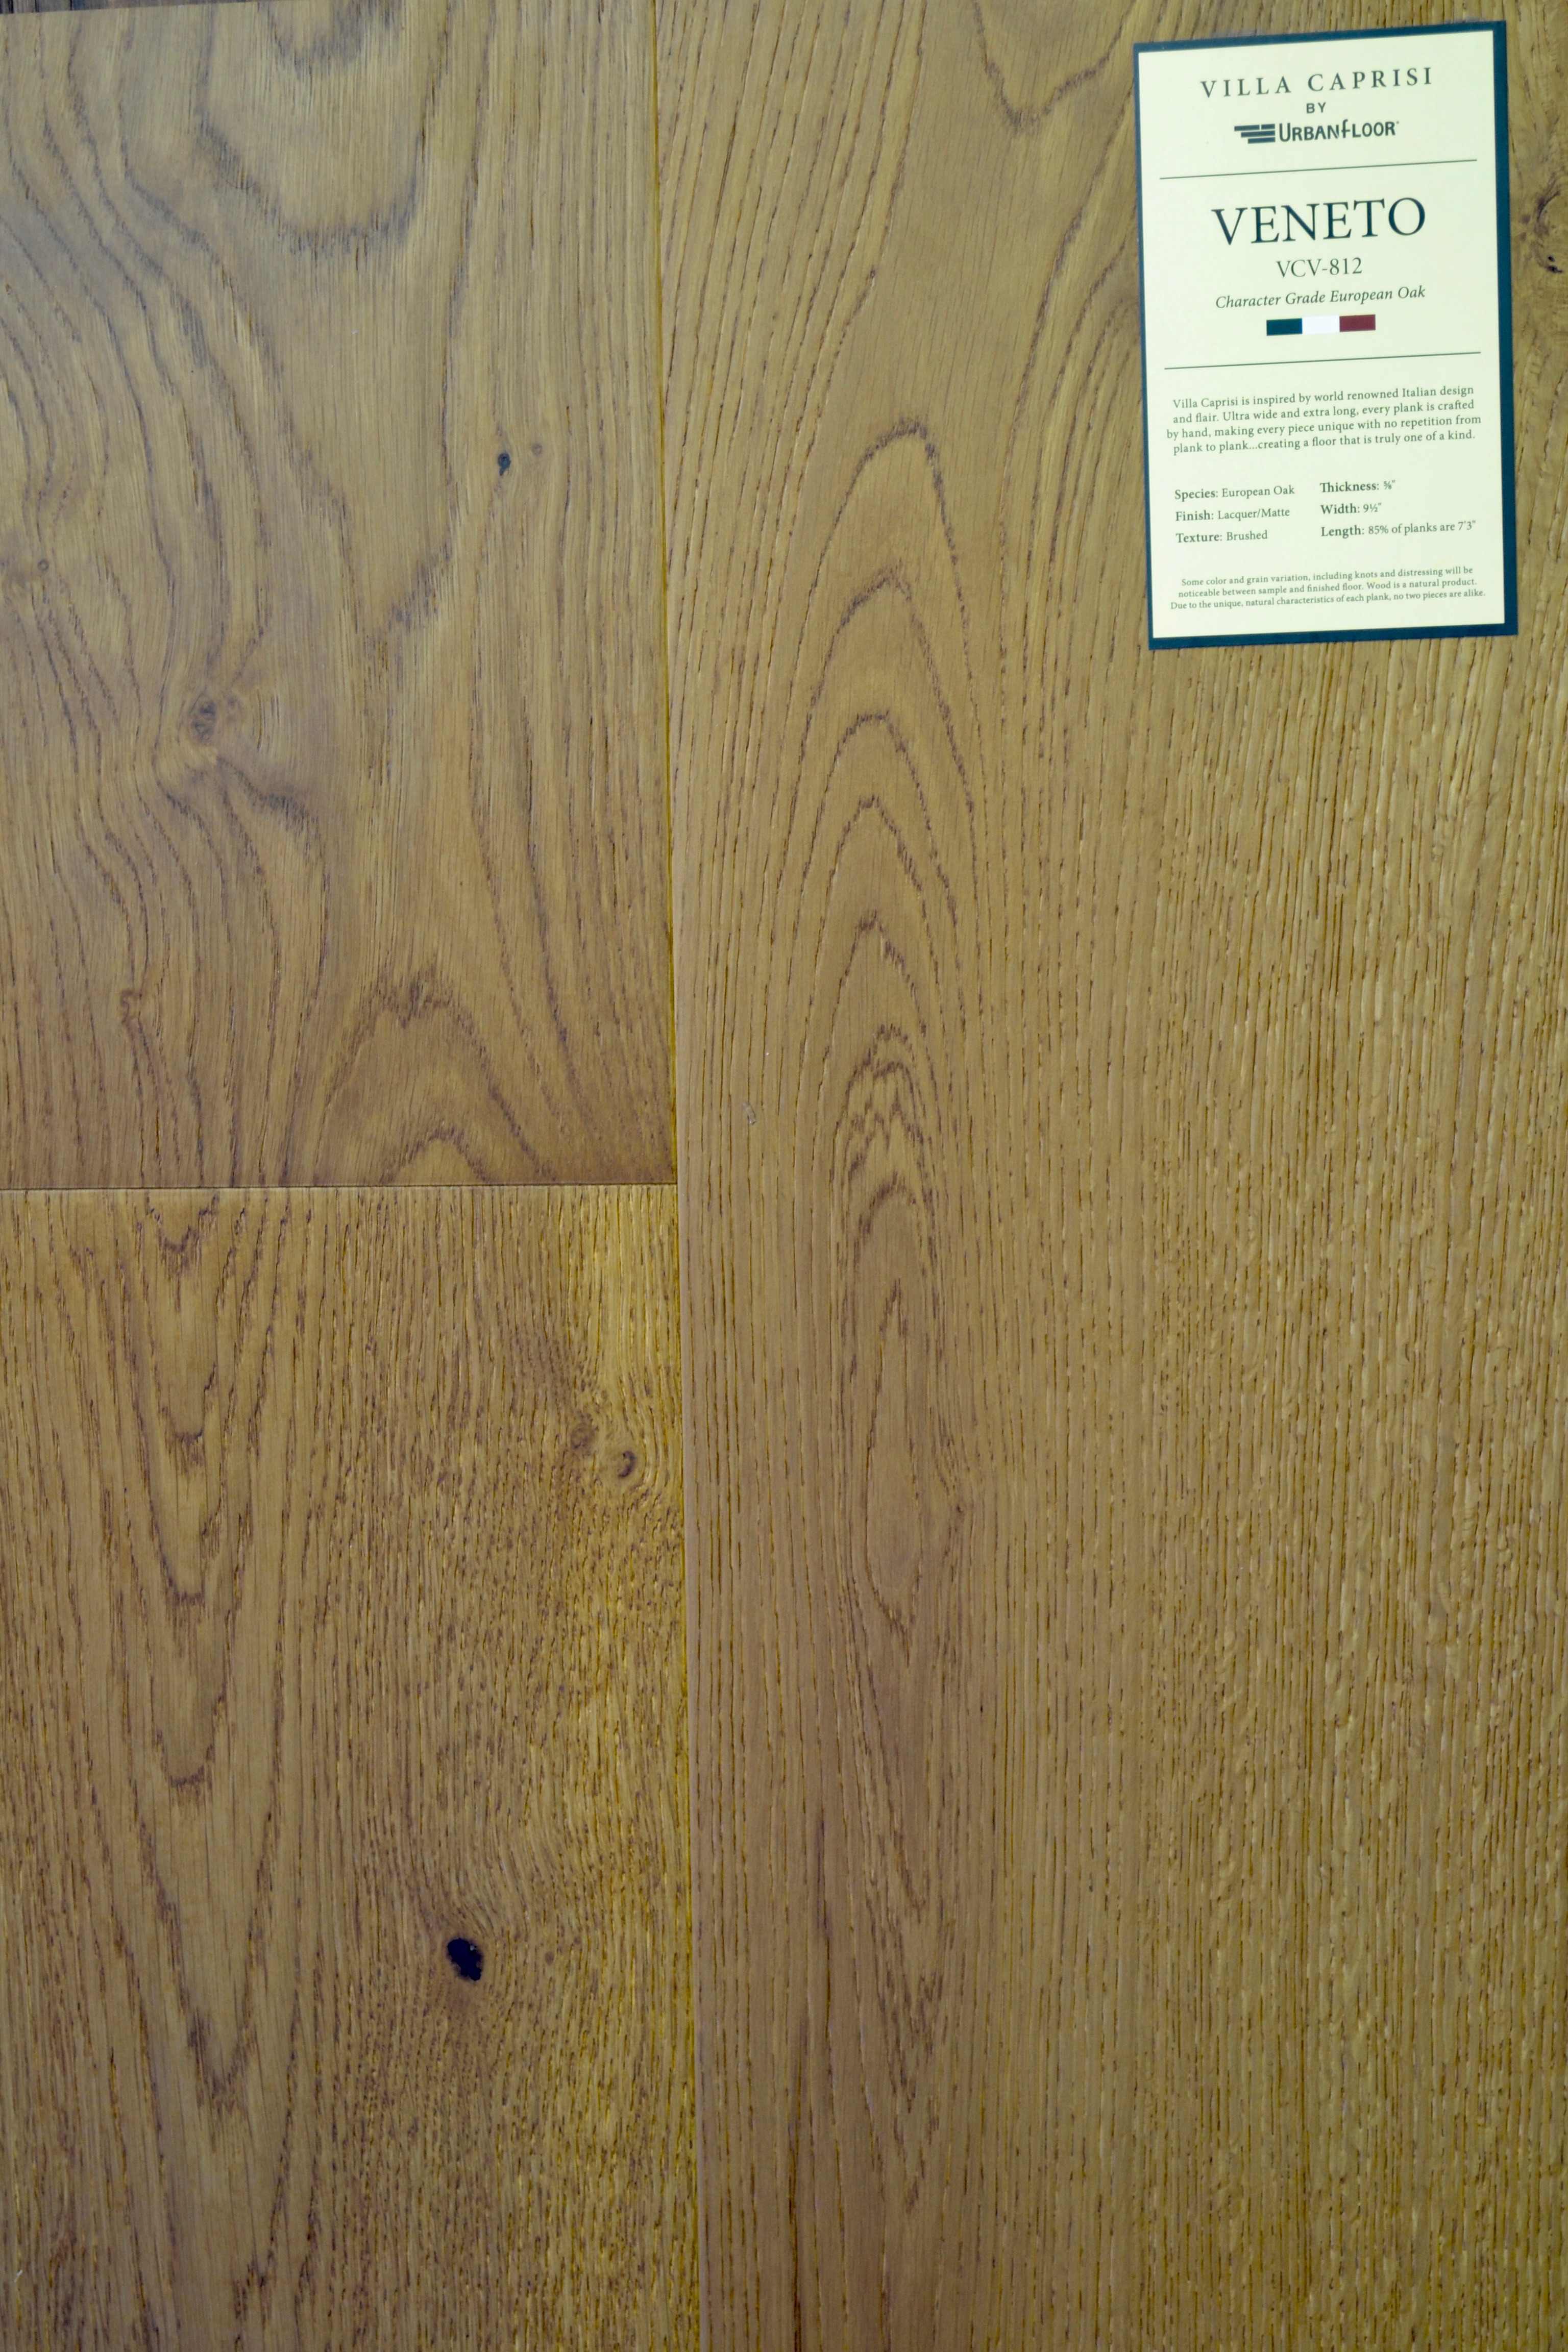 5 inch wide hardwood flooring of villa caprisi fine european hardwood millennium hardwood within european style inspired designer oak floor veneto by villa caprisi